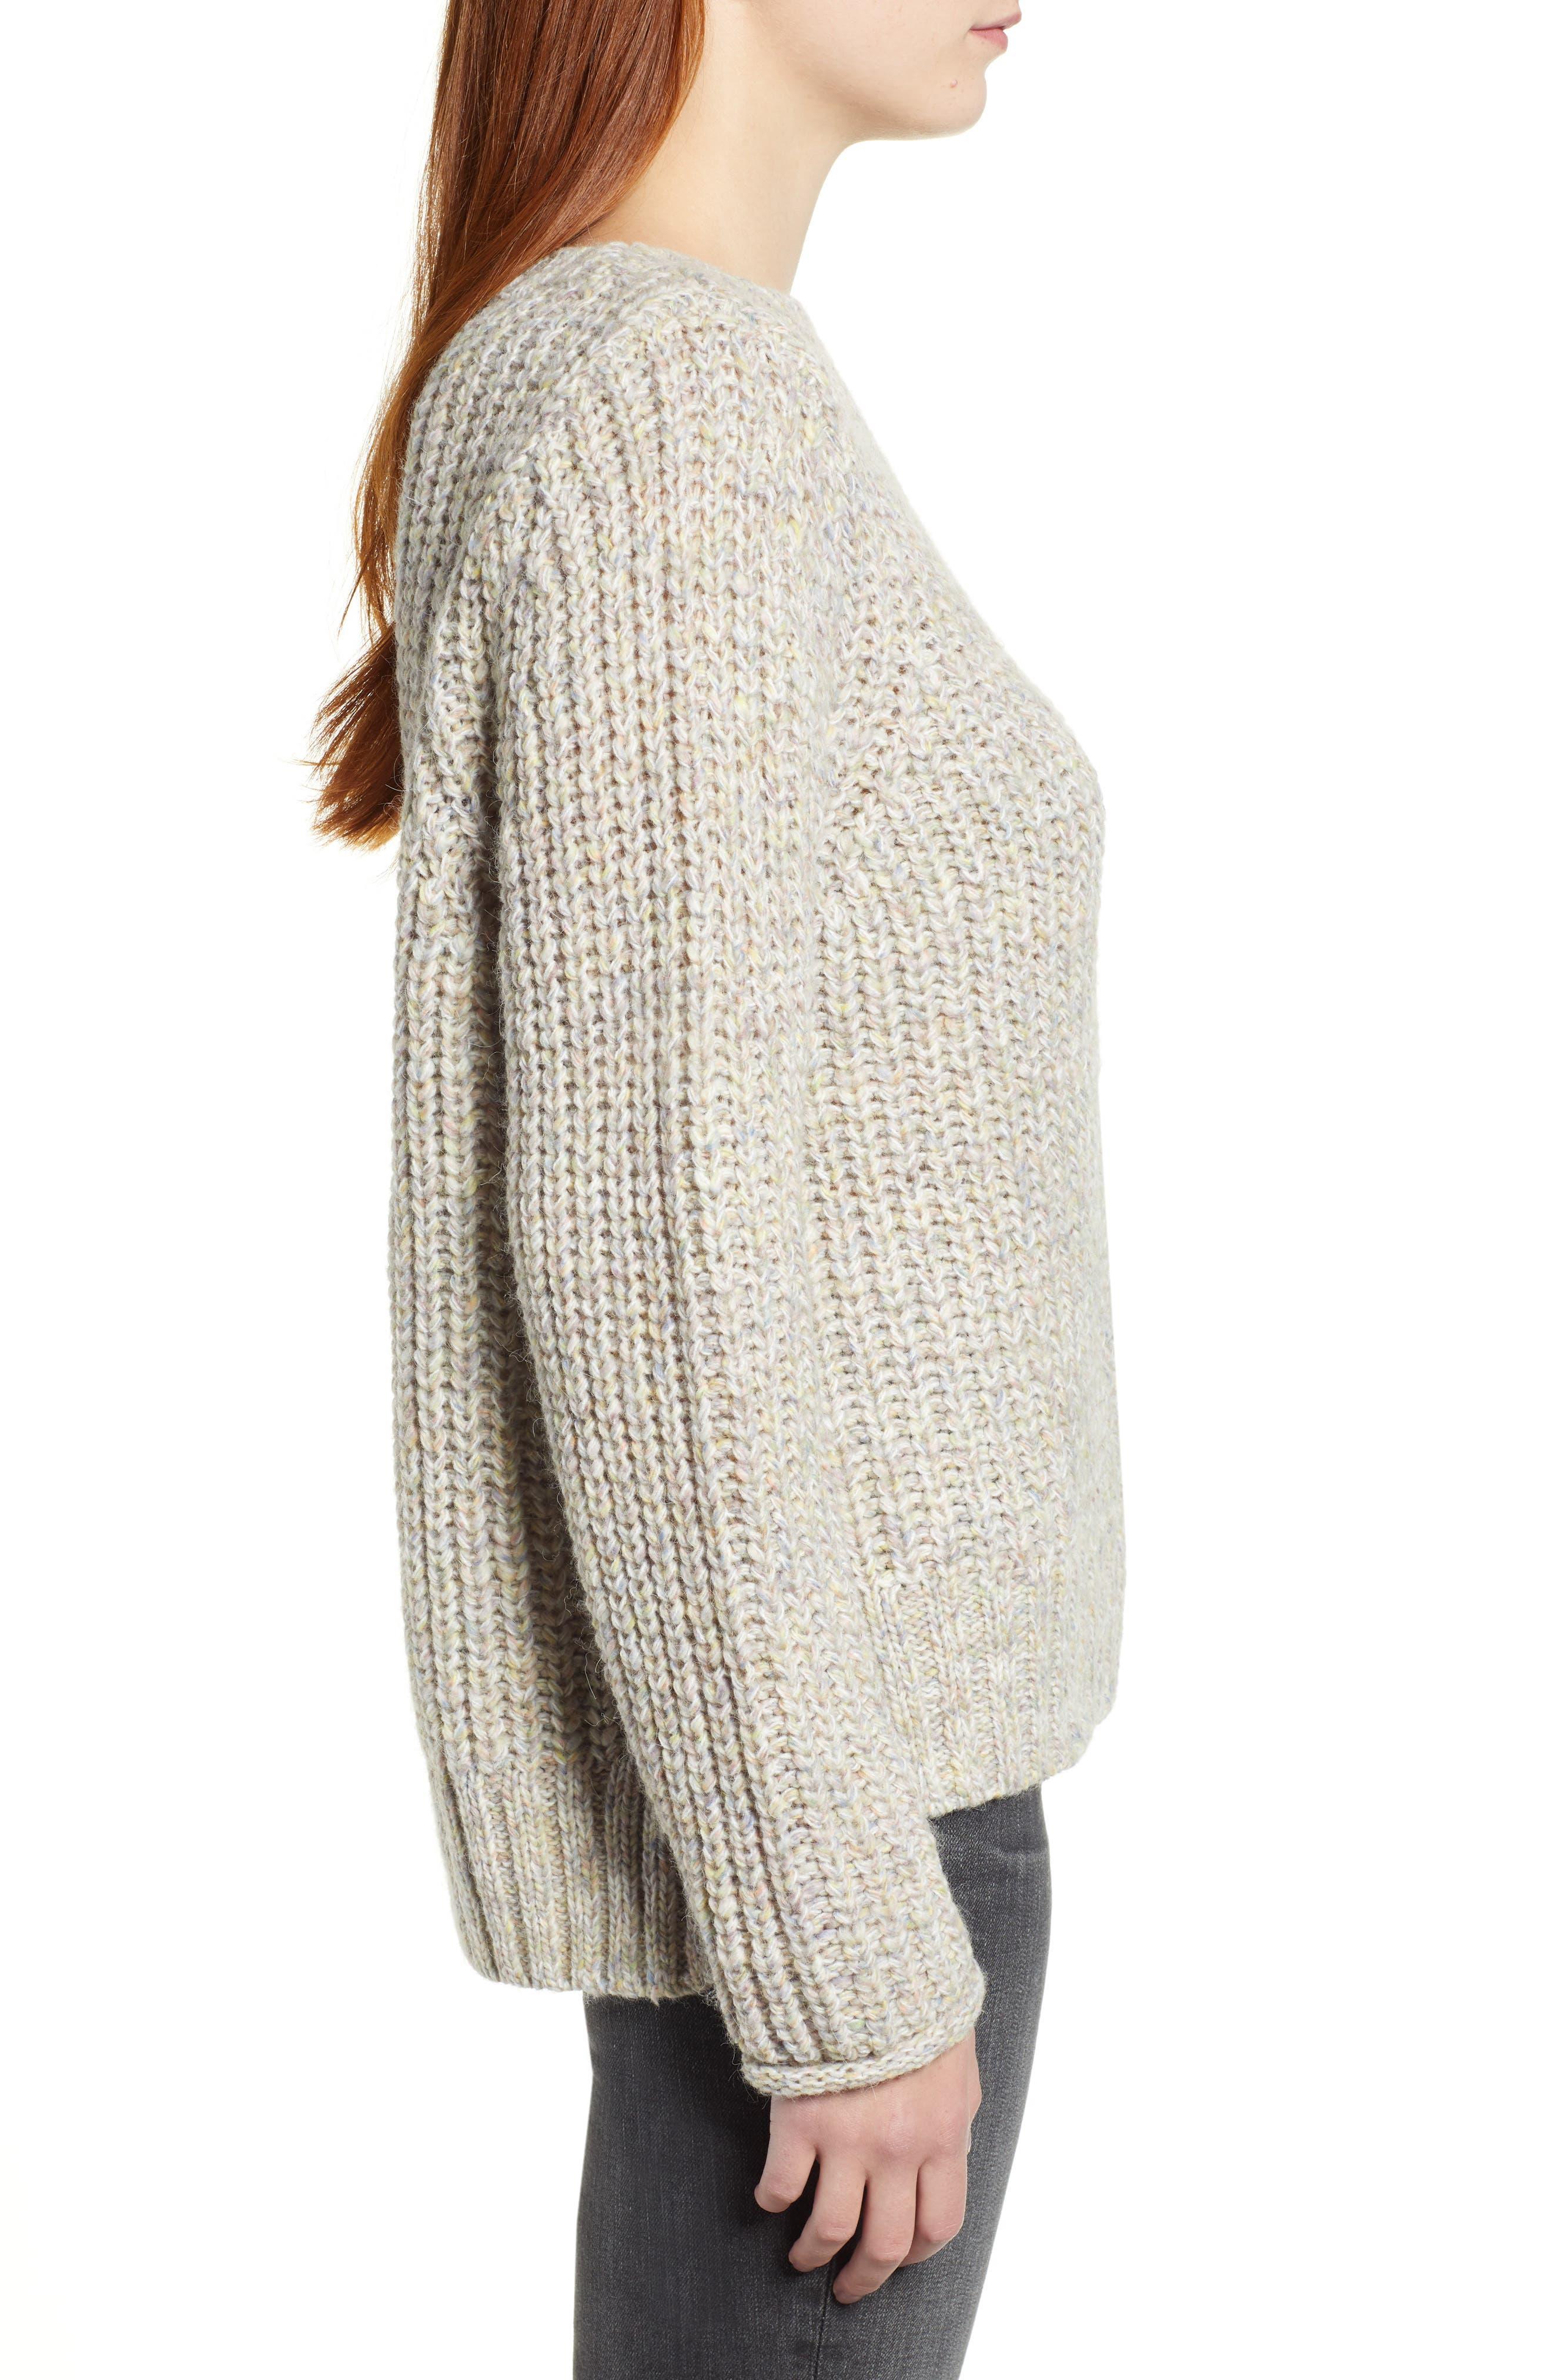 Boat Neck Sweater,                             Alternate thumbnail 3, color,                             BEIGE POPCORN PATTERN